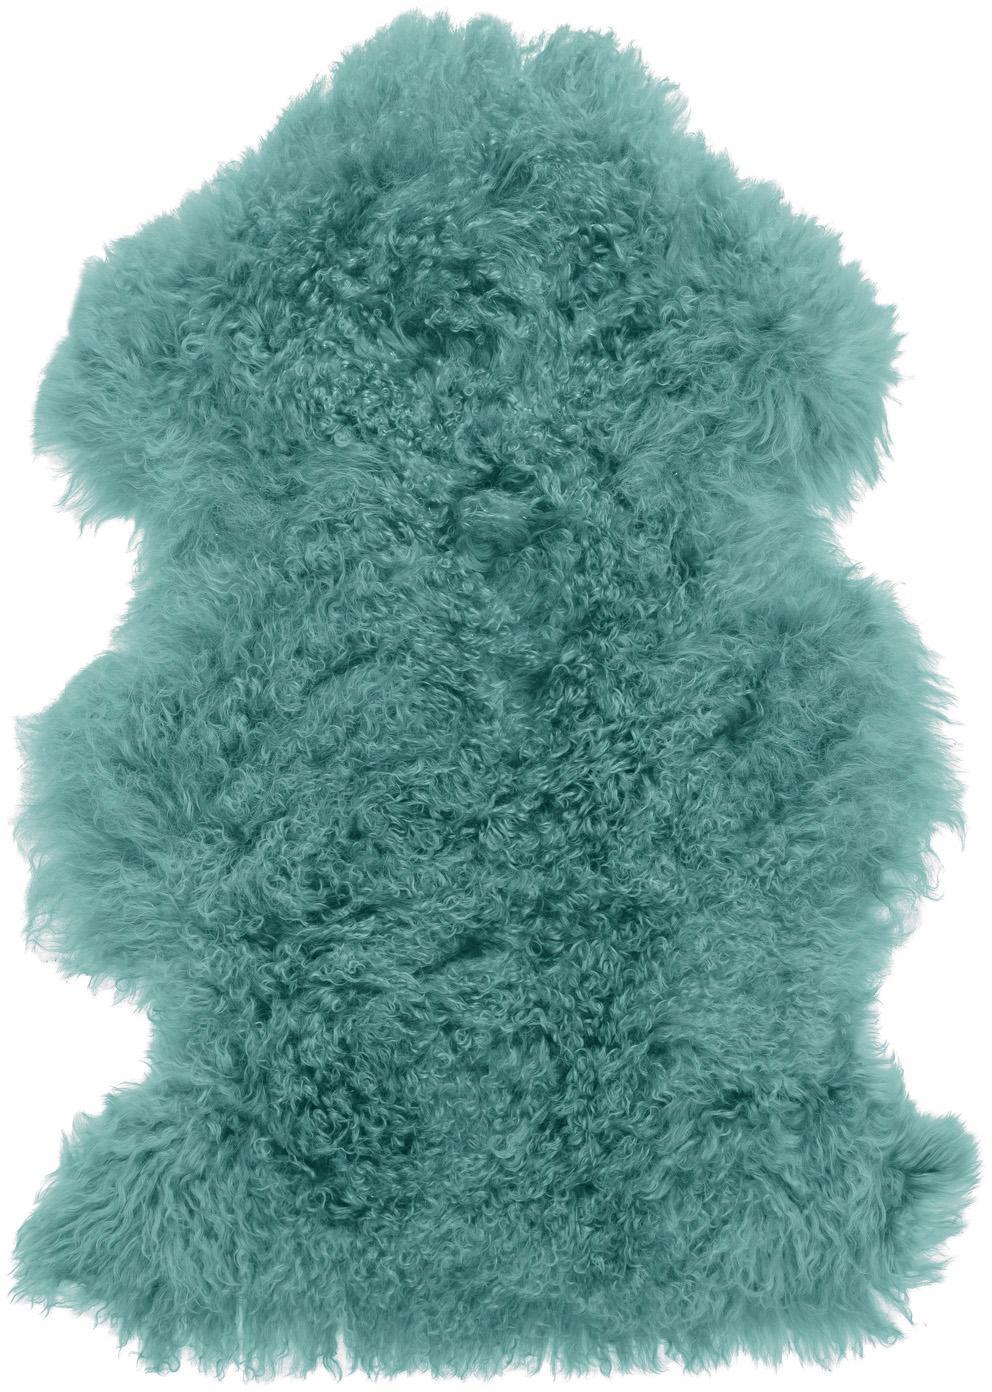 Langhaar-Lammfell Ella, gelockt, Vorderseite: Mongolisches Lammfell, Rückseite: Leder, Dunkles Türkis, 50 x 80 cm